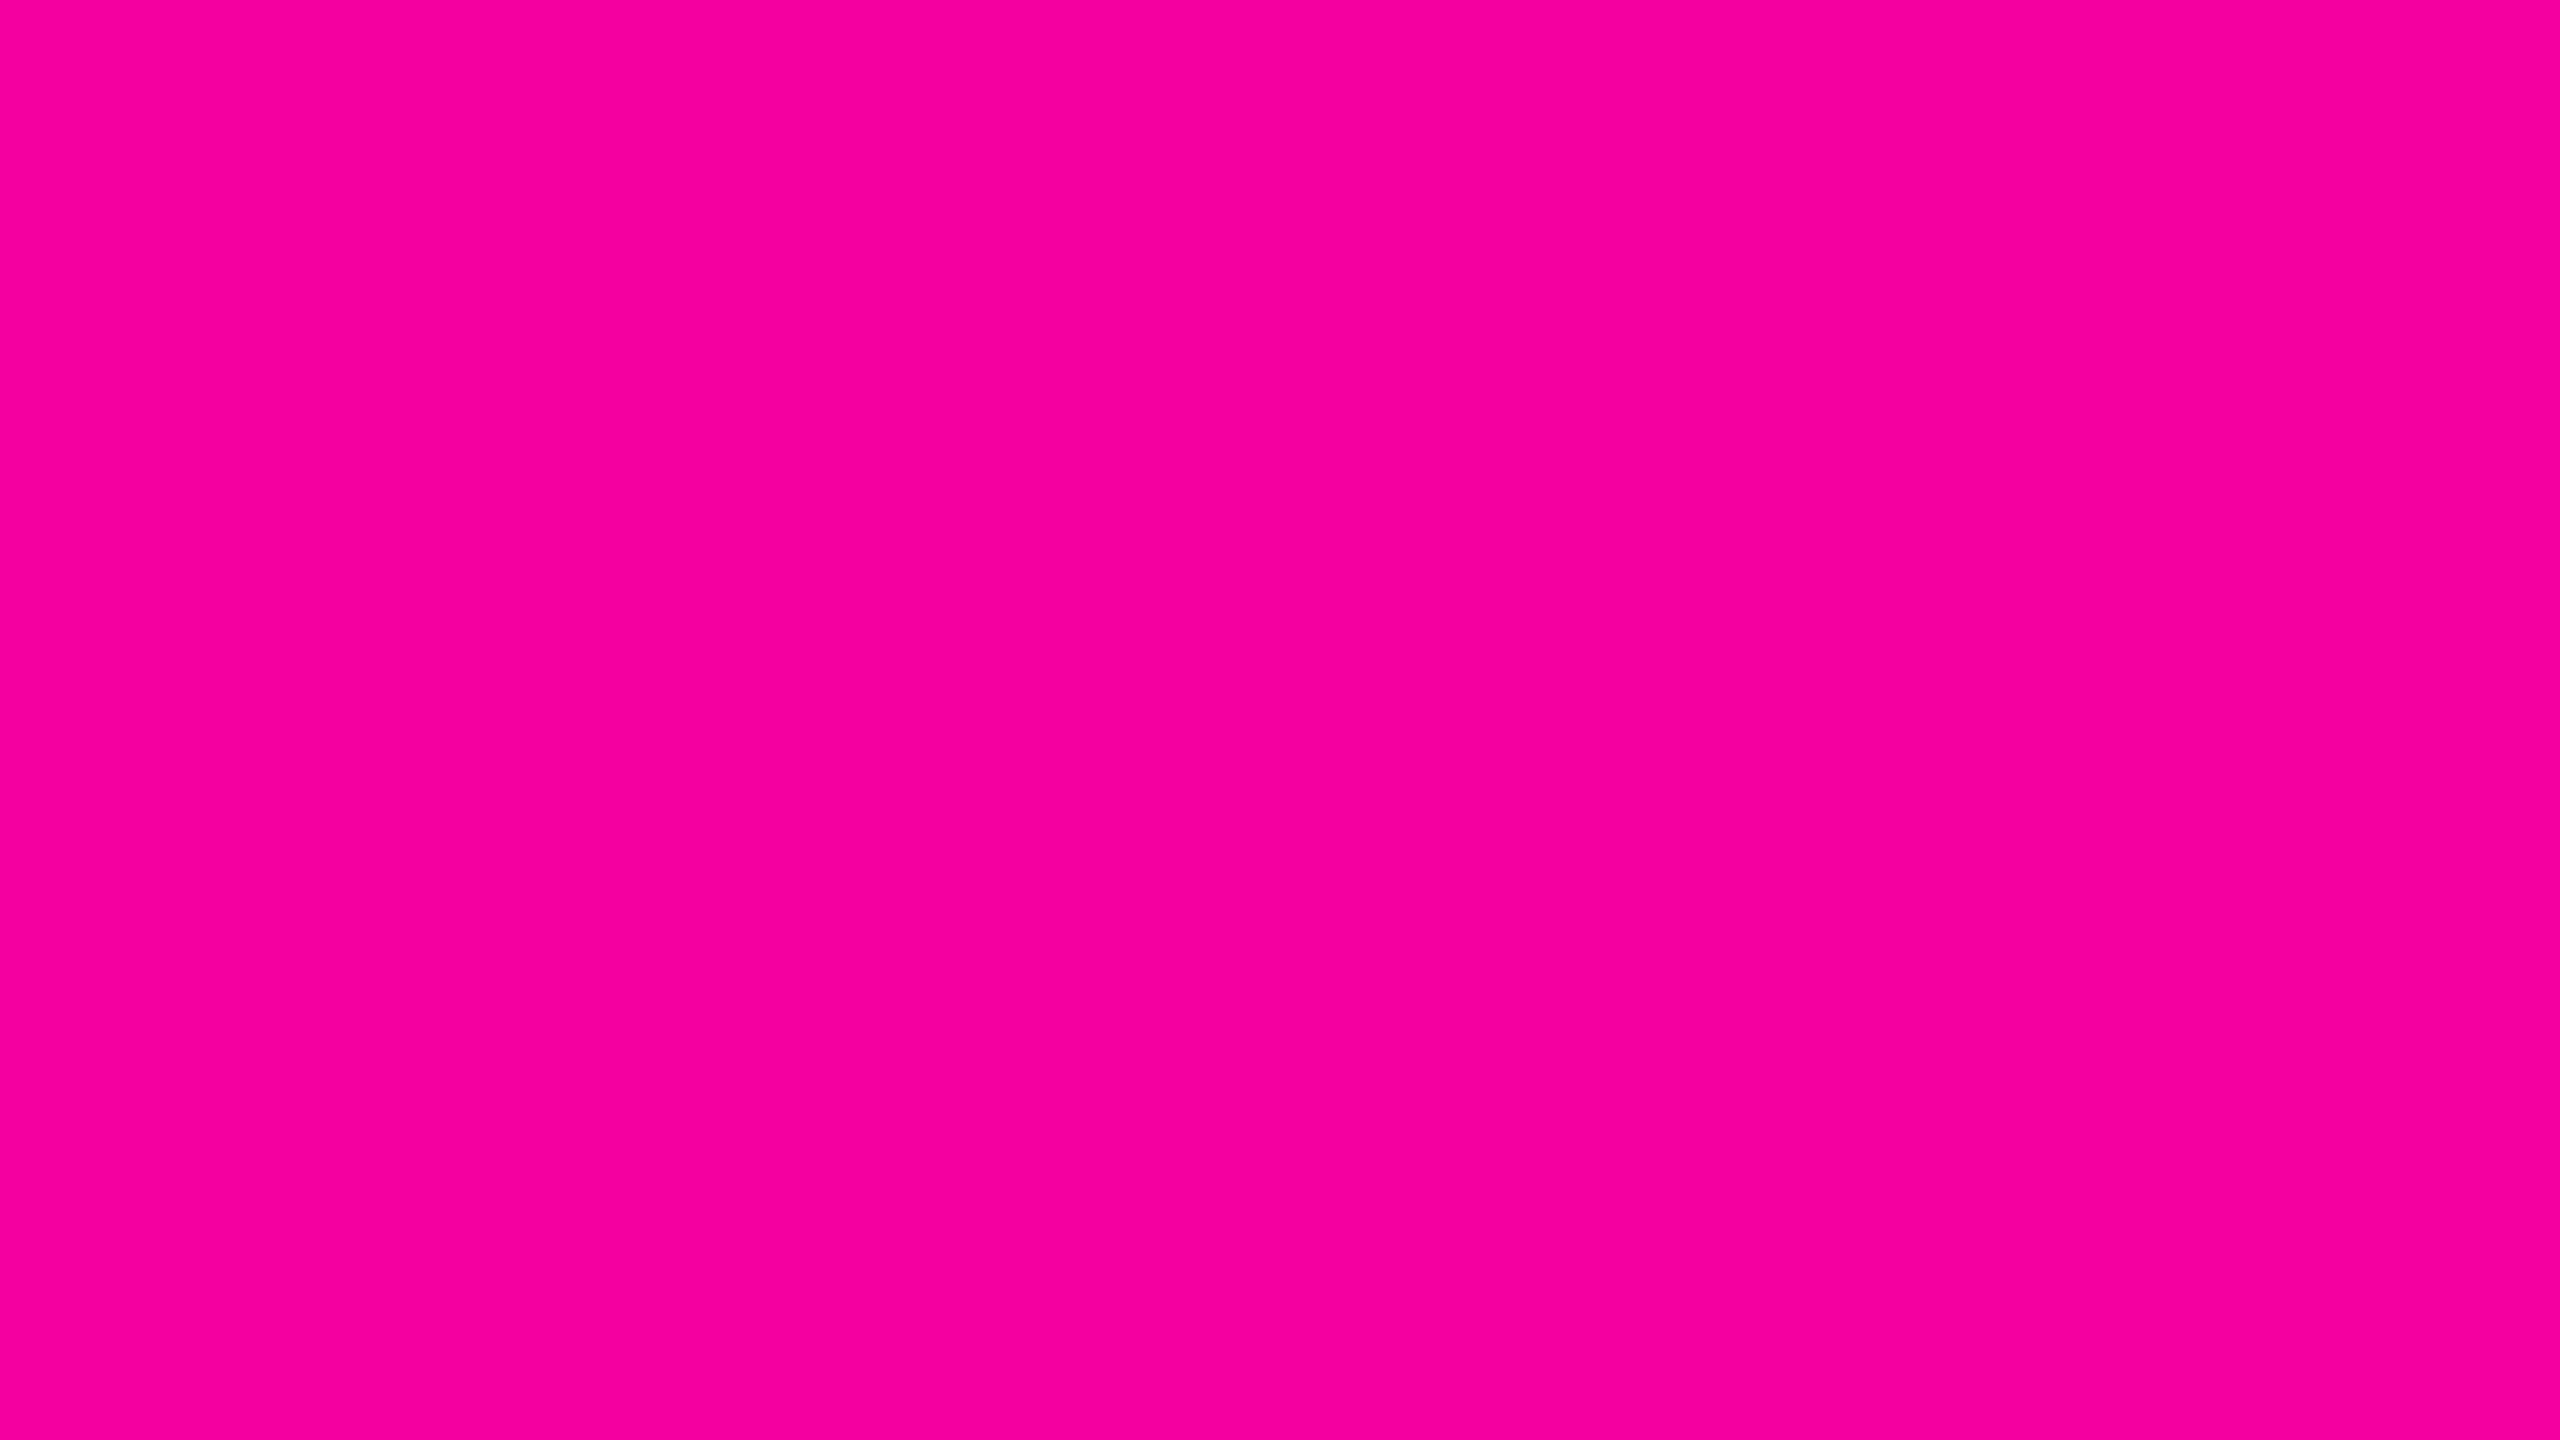 Fashion Fuchsia Solid Color Background